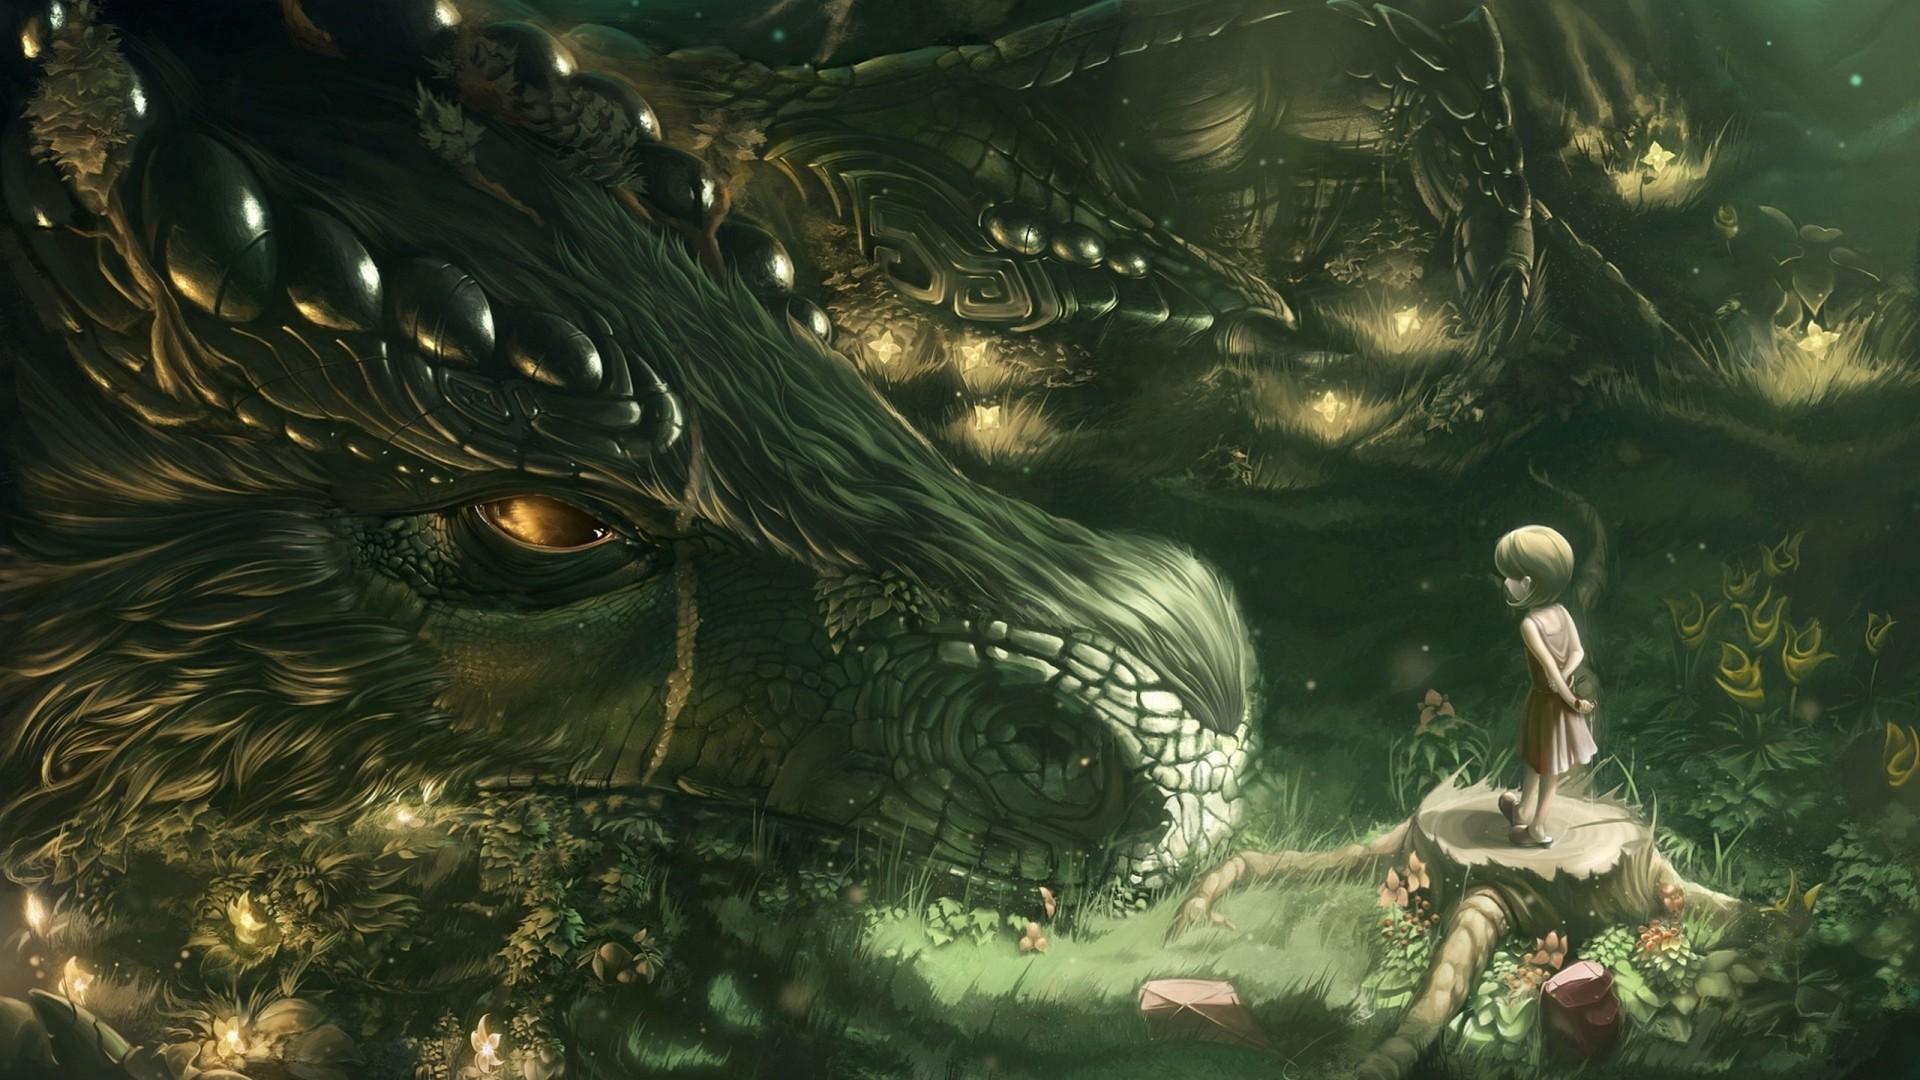 1920x1080 Preview wallpaper dragon, girl, forest, art 1920x1080